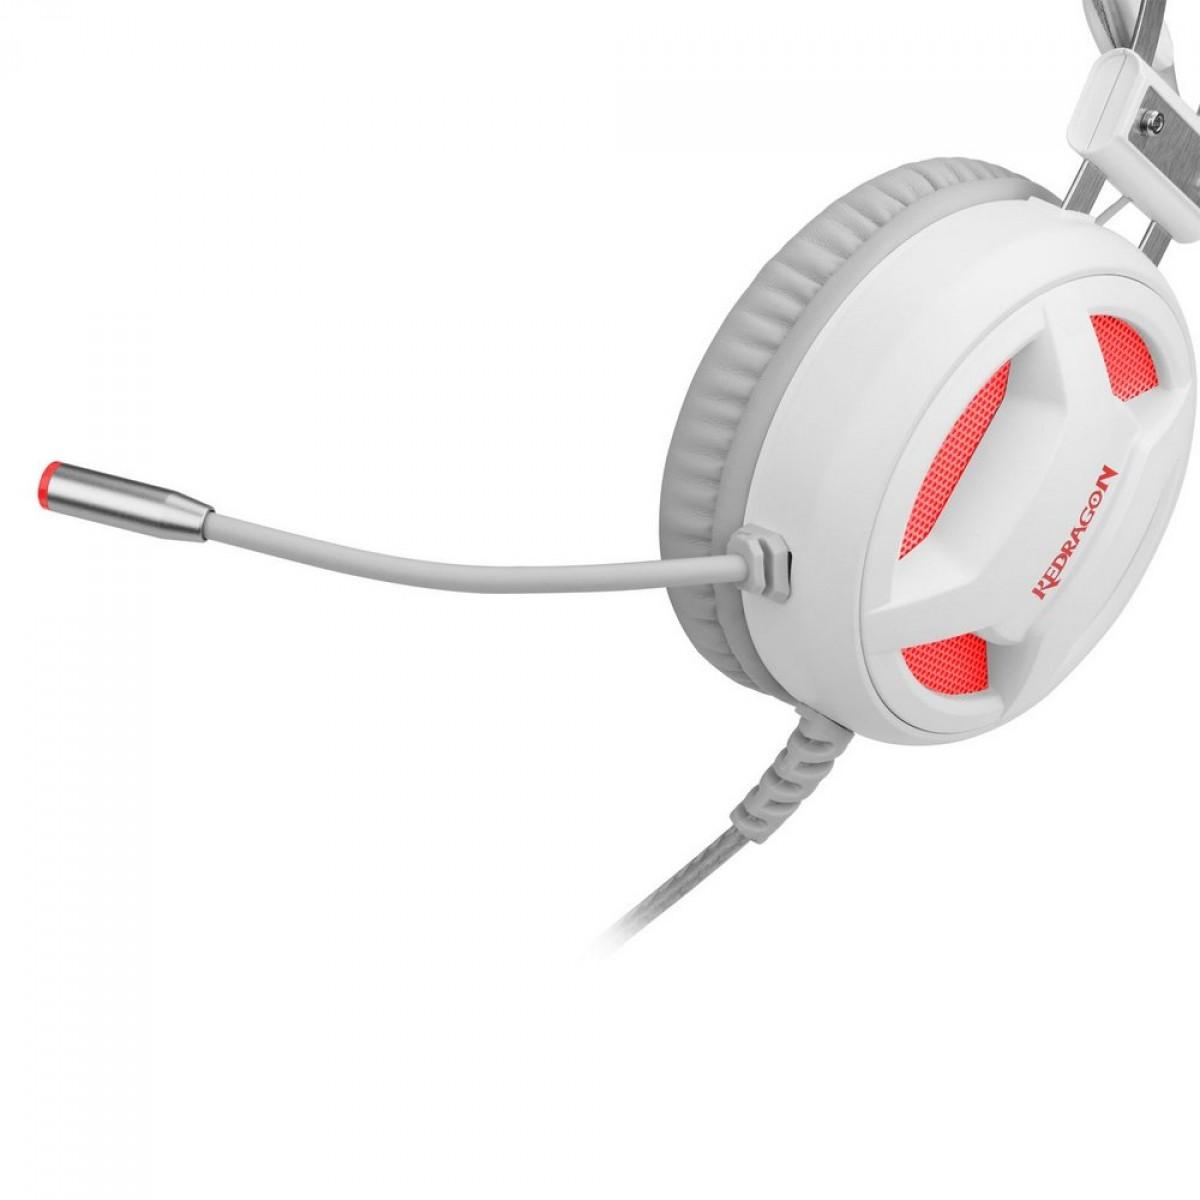 Headset Gamer Redragon Minos H210W, Surround 7.1, White, USB, H210W